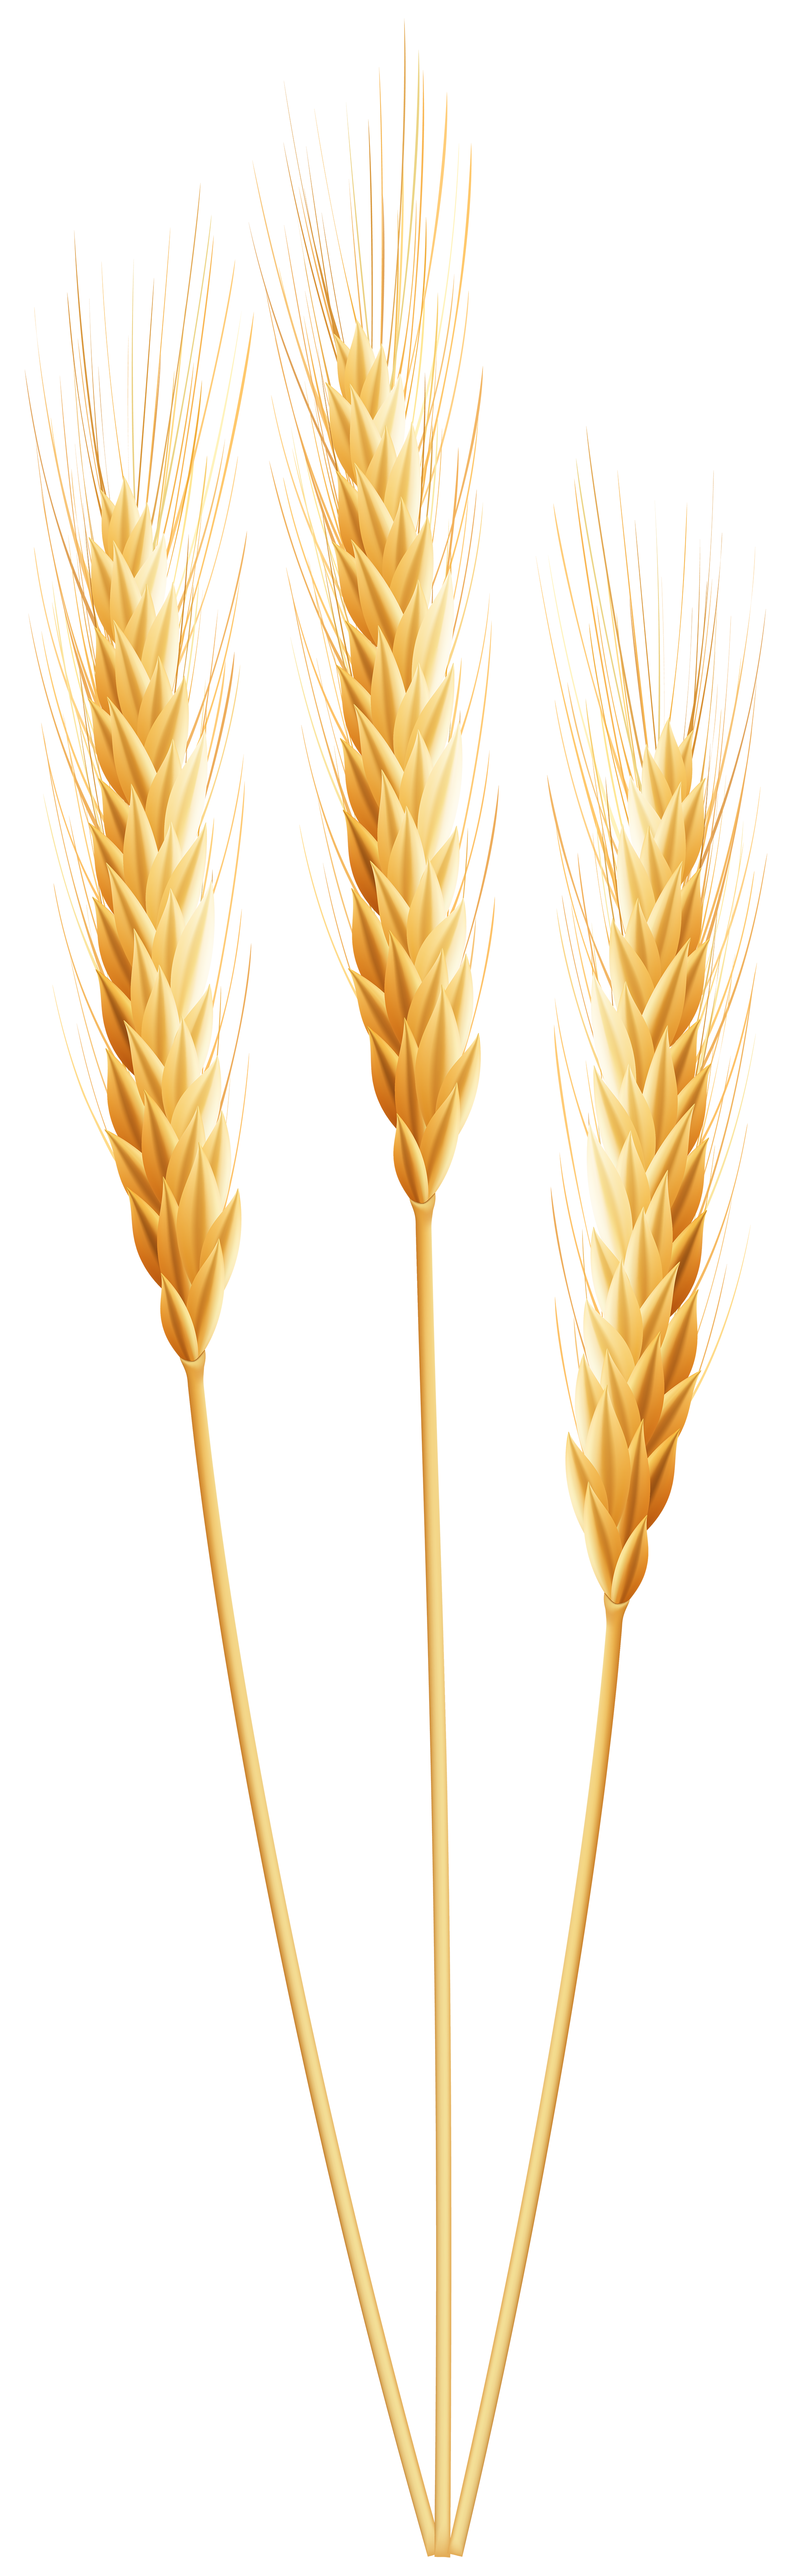 Wheat Png Clip Art Leaves Illustration Illustration